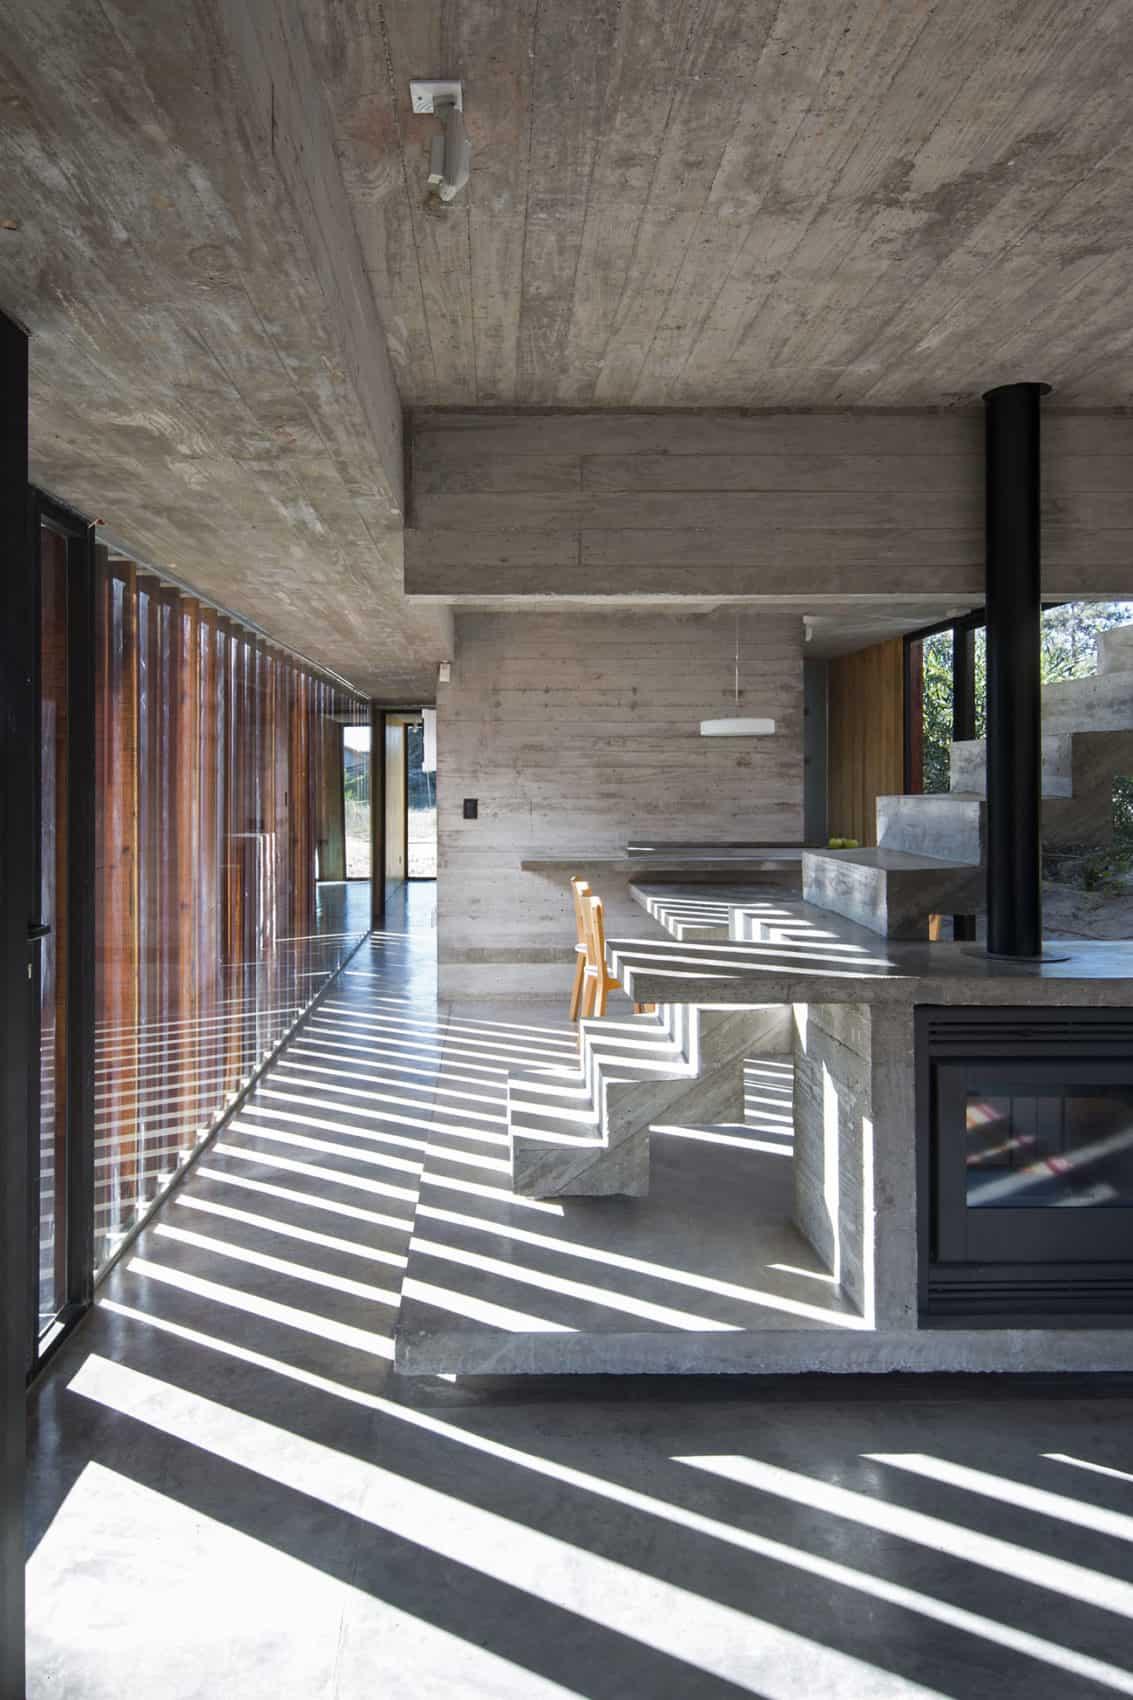 MR House by Luciano Kruk Arquitectos (12)